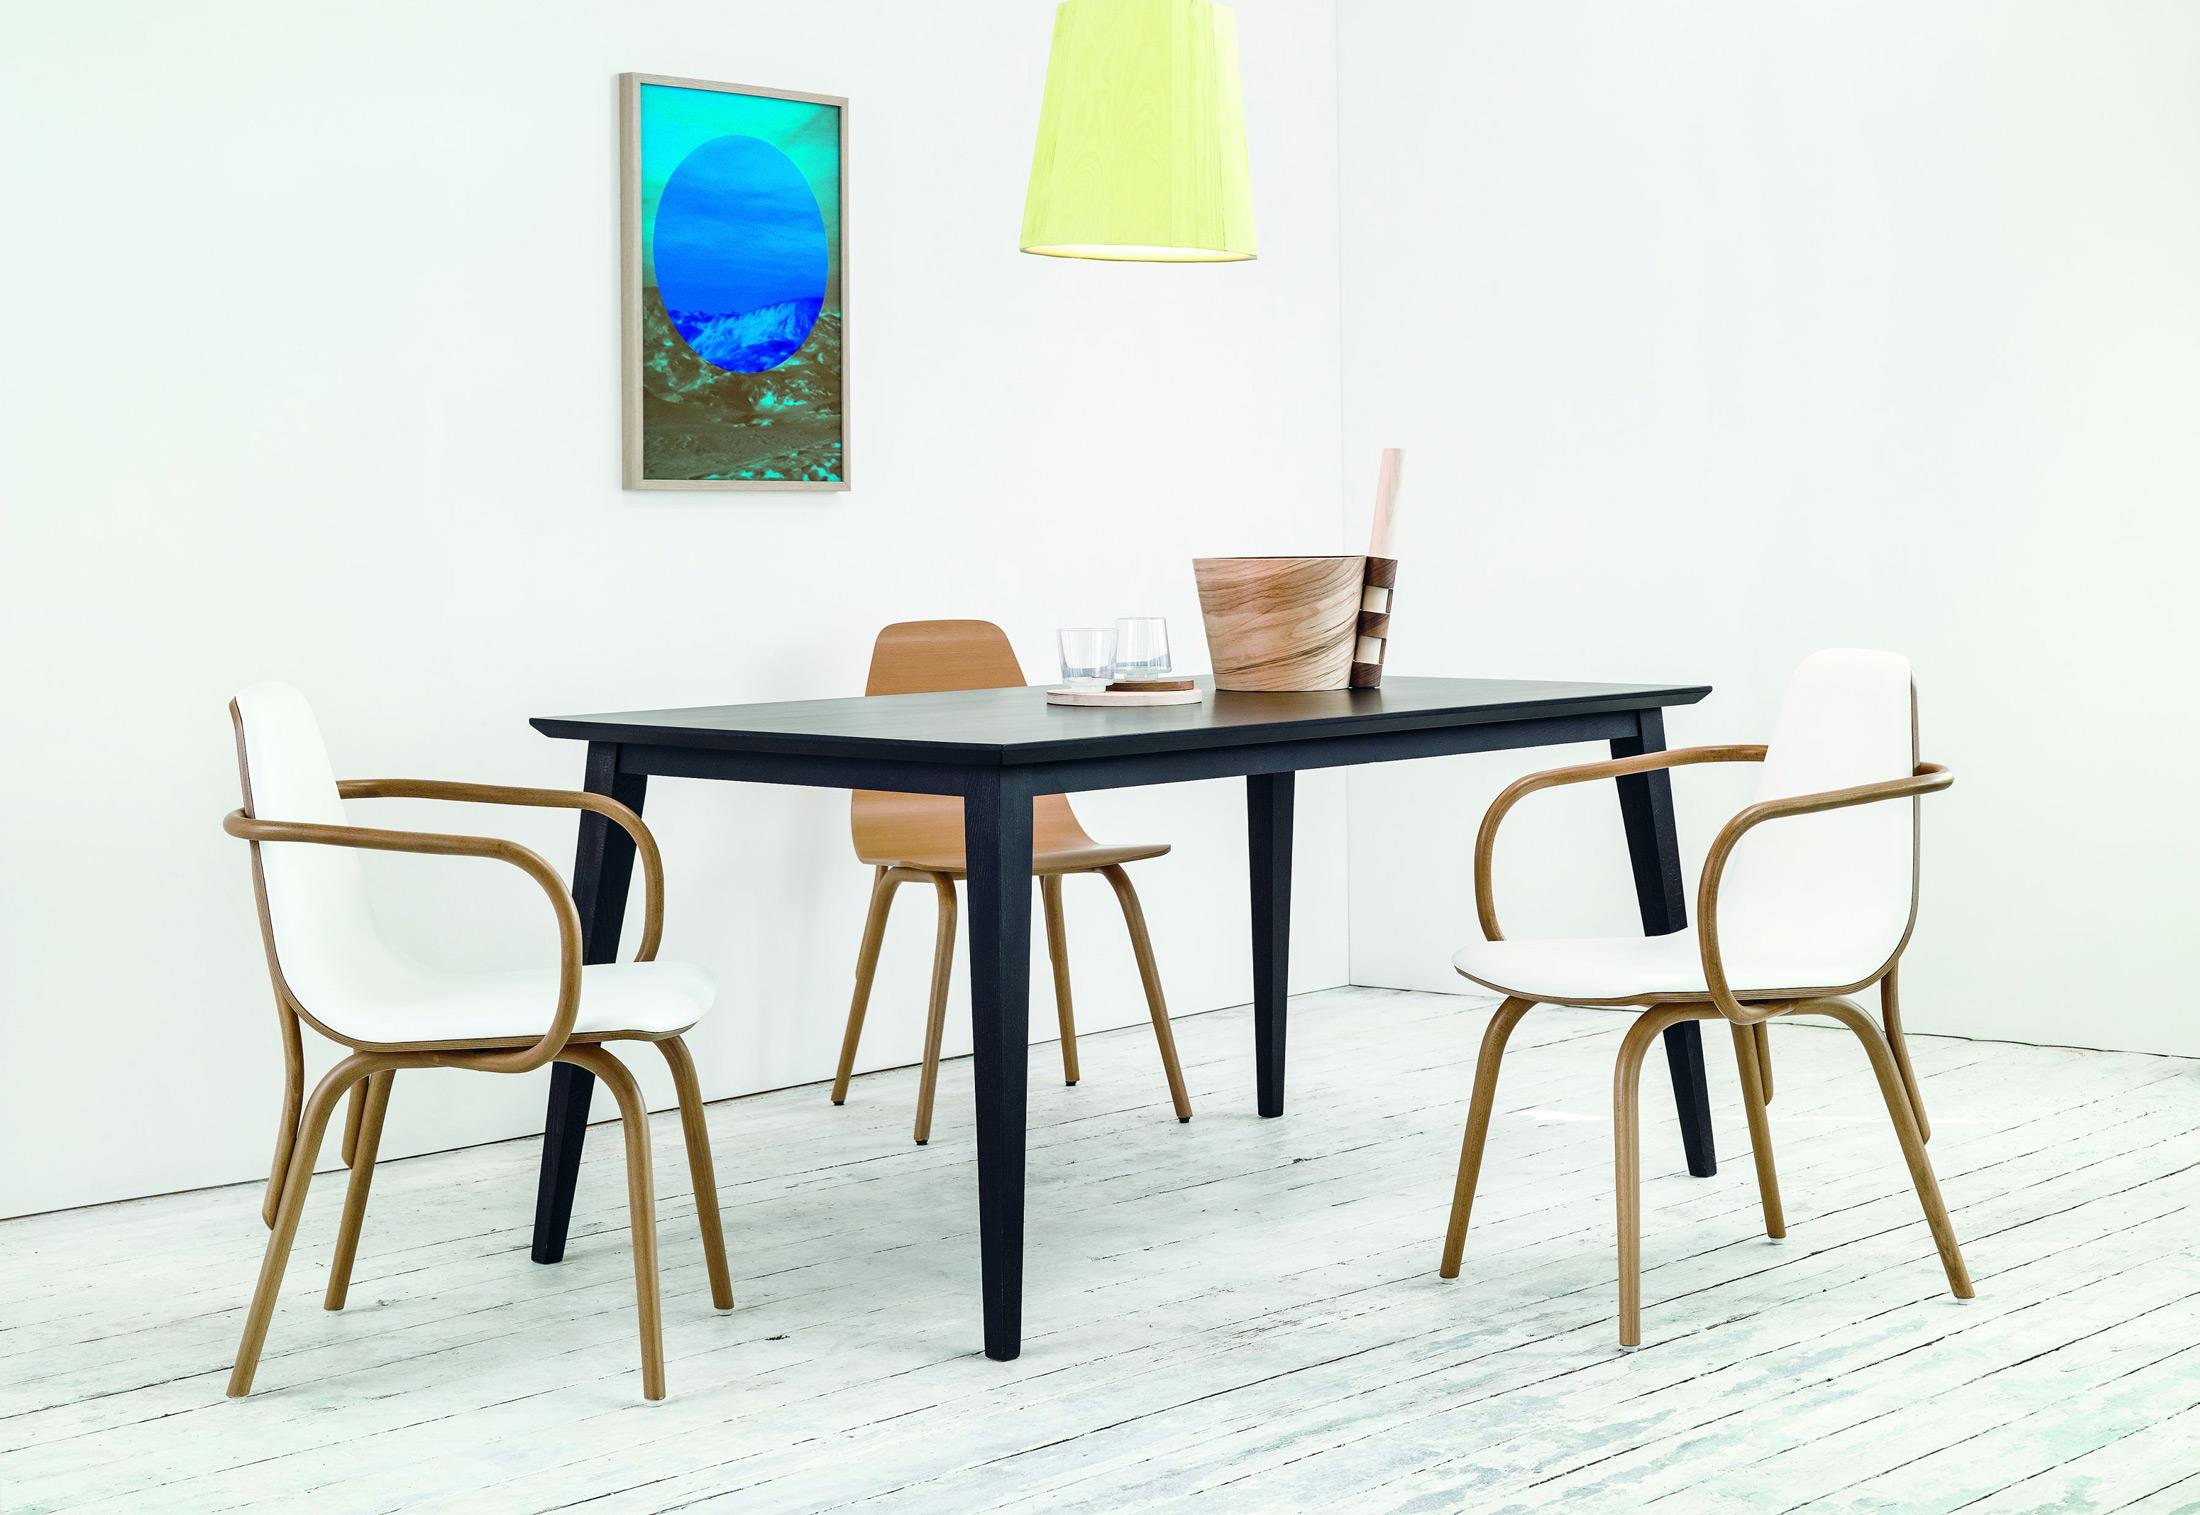 tram armlehnstuhl gepolstert von ton stylepark. Black Bedroom Furniture Sets. Home Design Ideas